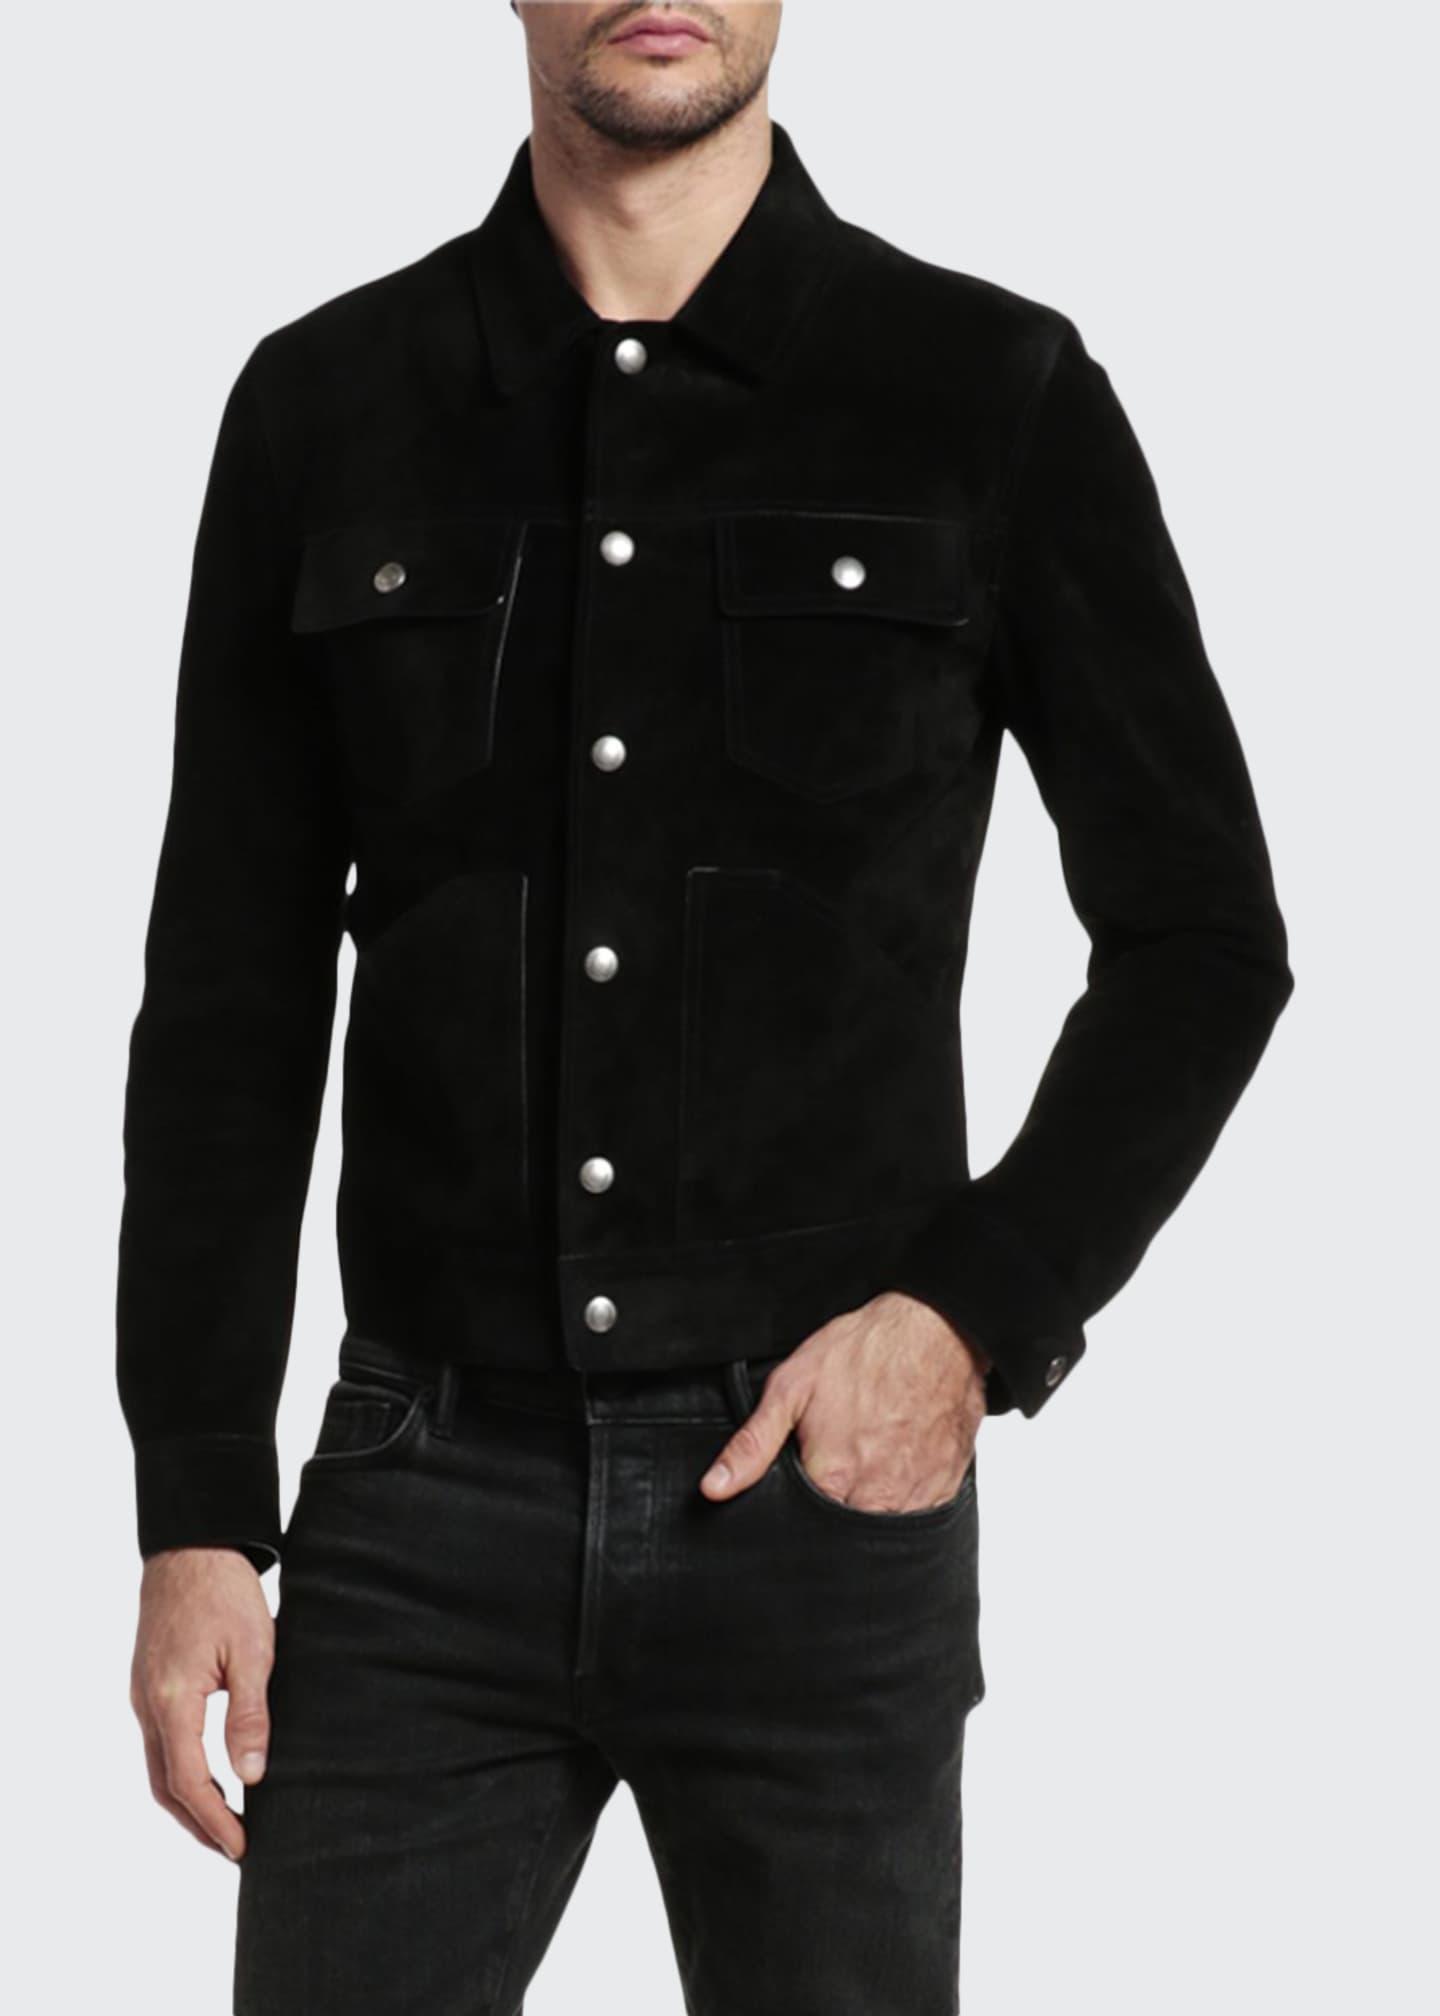 TOM FORD Men's Dark-Wash Denim Jacket